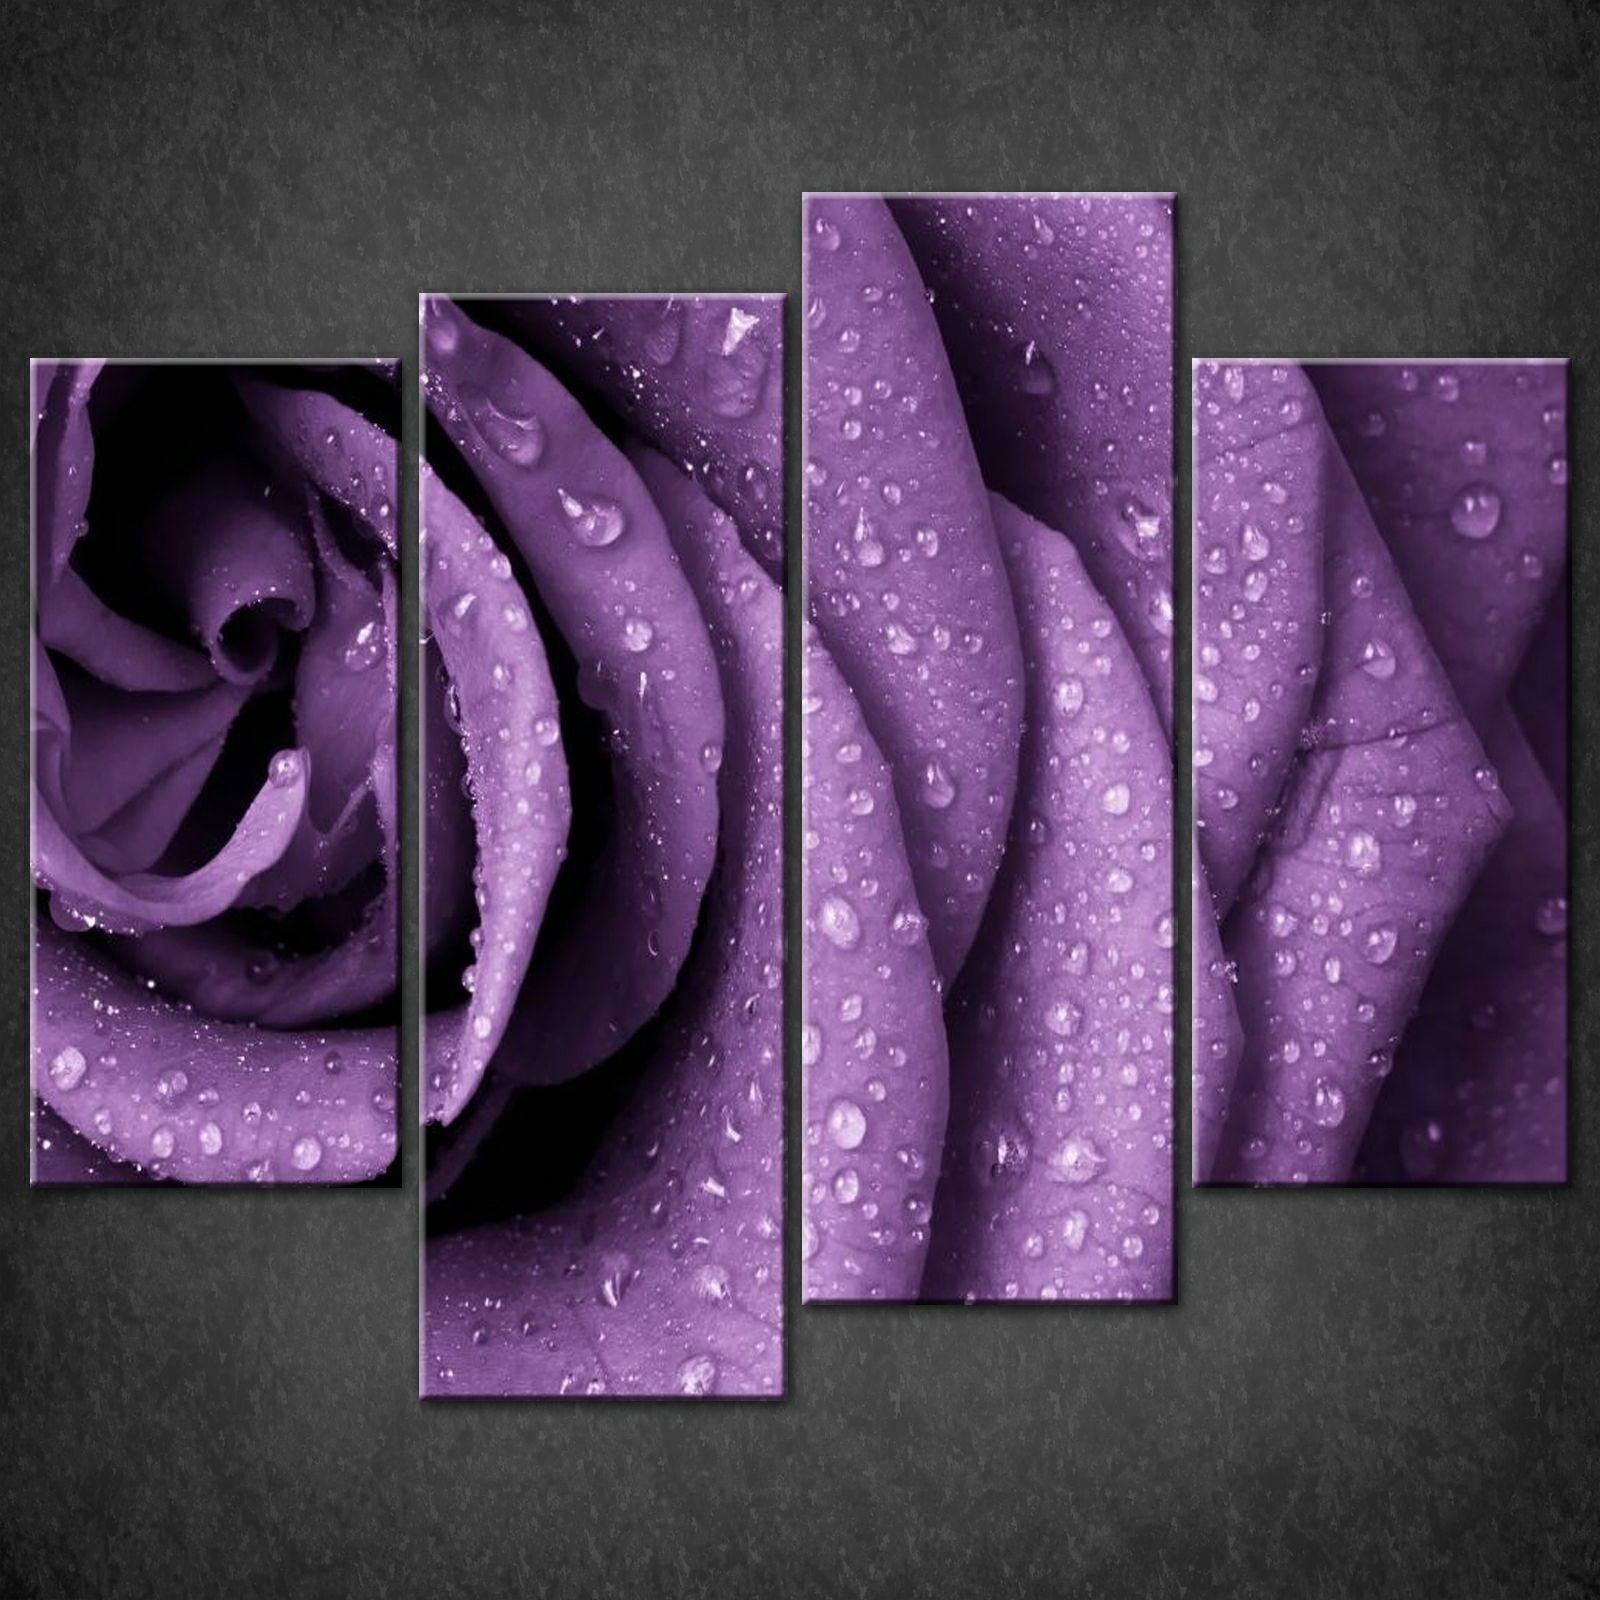 Wall Art Designs: Top Purple Canvas Wall Art Uk Wall Decor Purple Within 2018 Purple Wall Art Canvas (View 4 of 20)